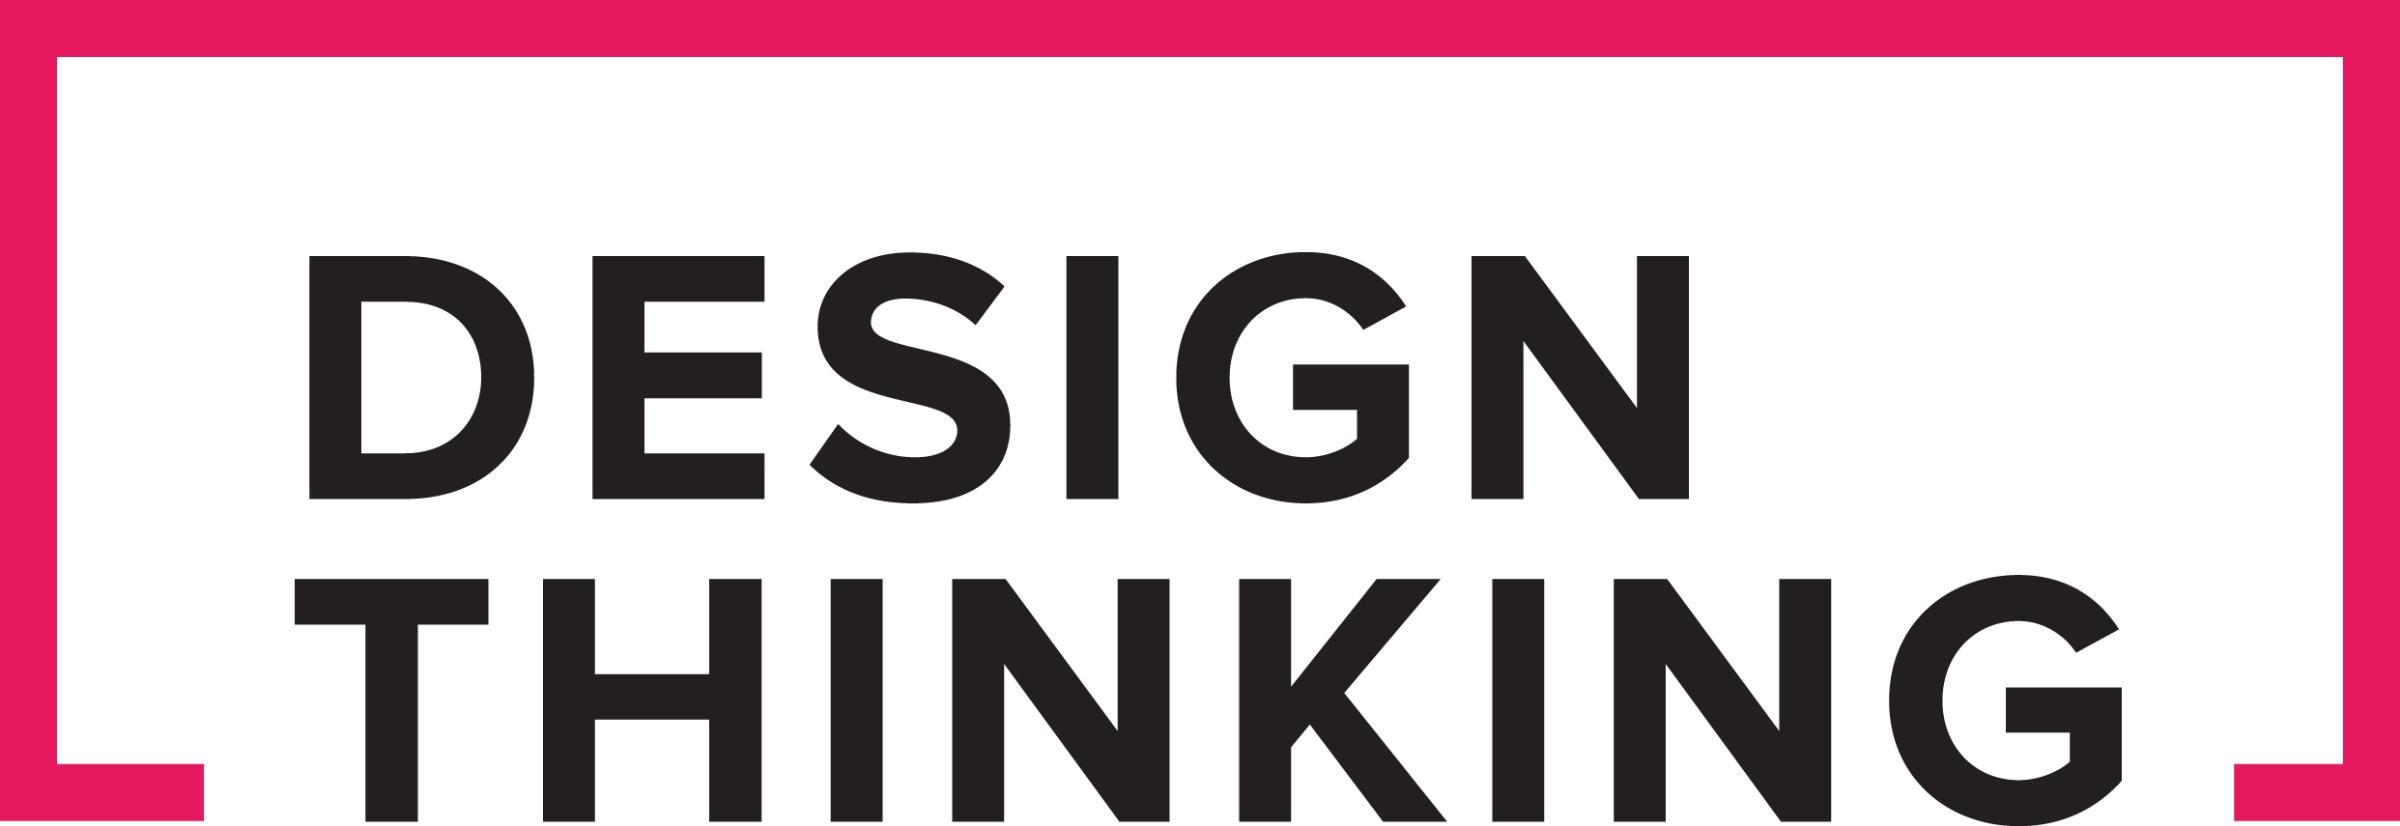 Design Thinking 2020